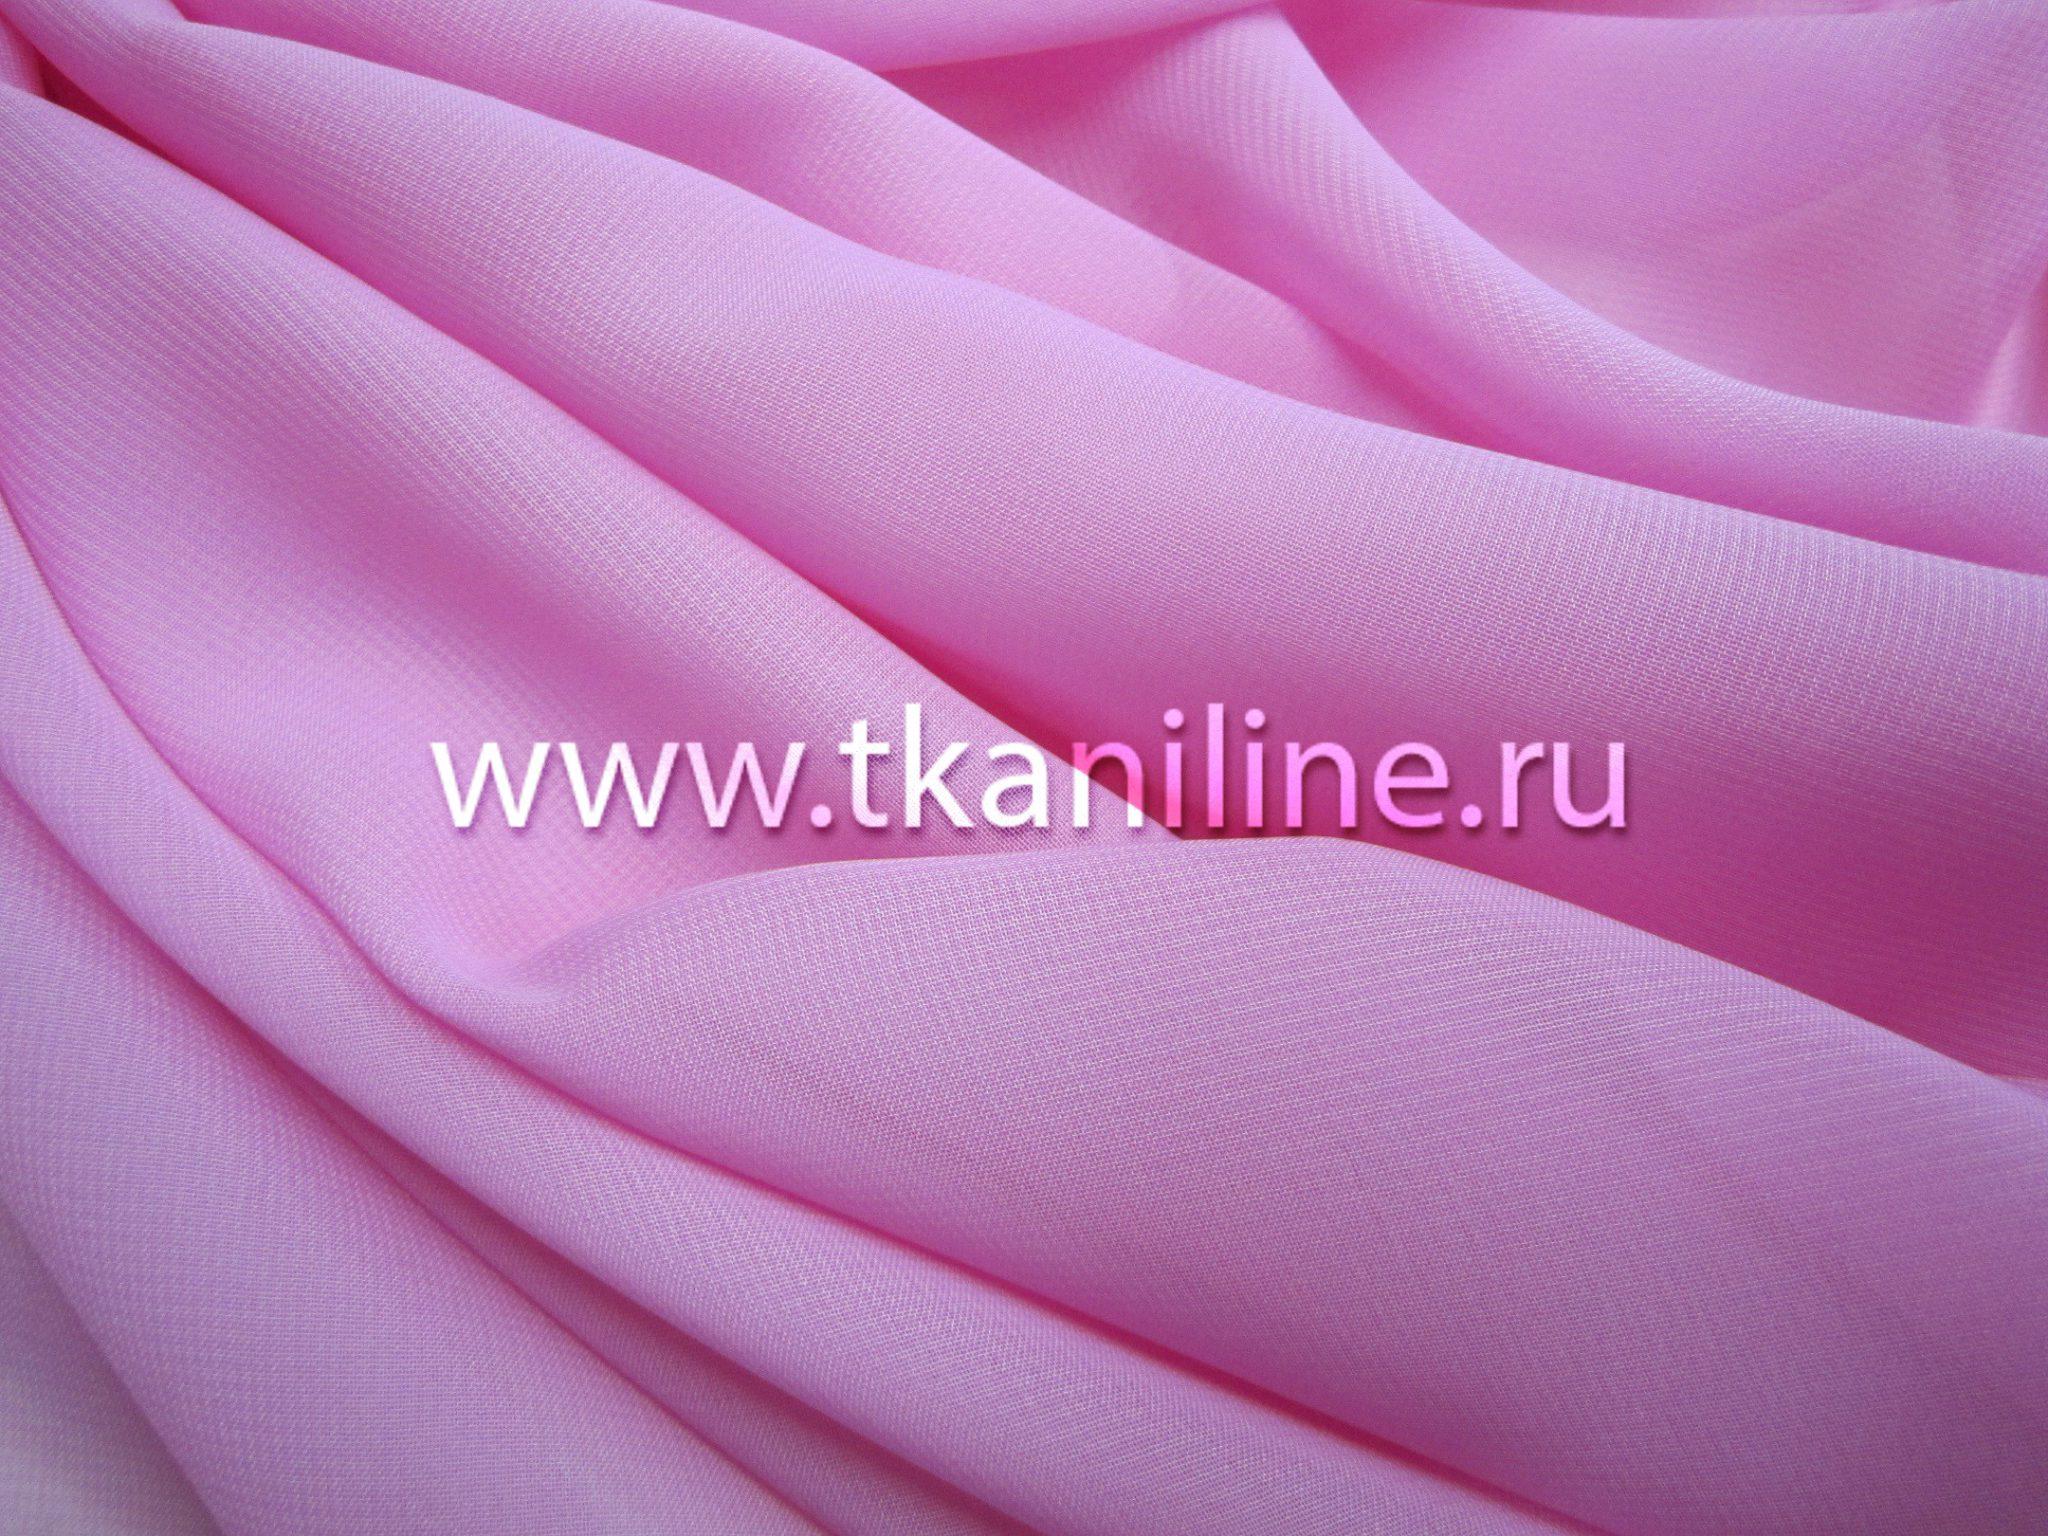 Шифон-розовый-арт.-602579